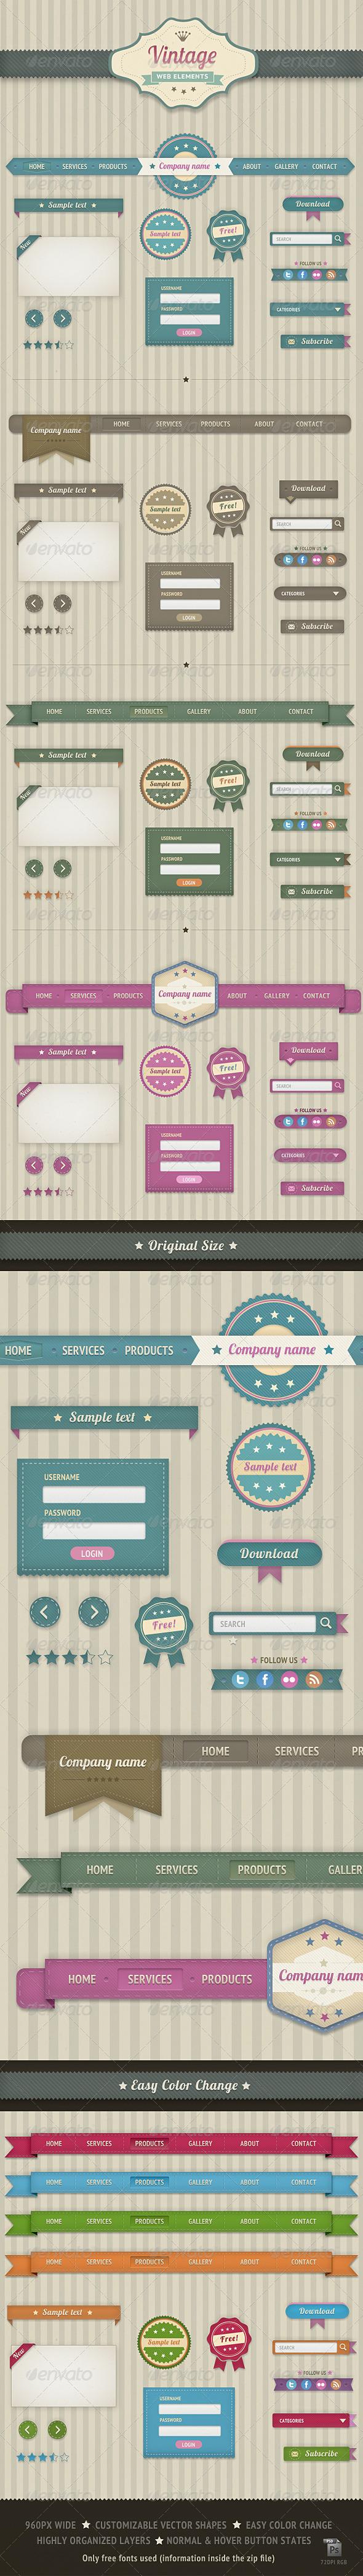 Vintage Web Elements - Navigation Bars Web Elements